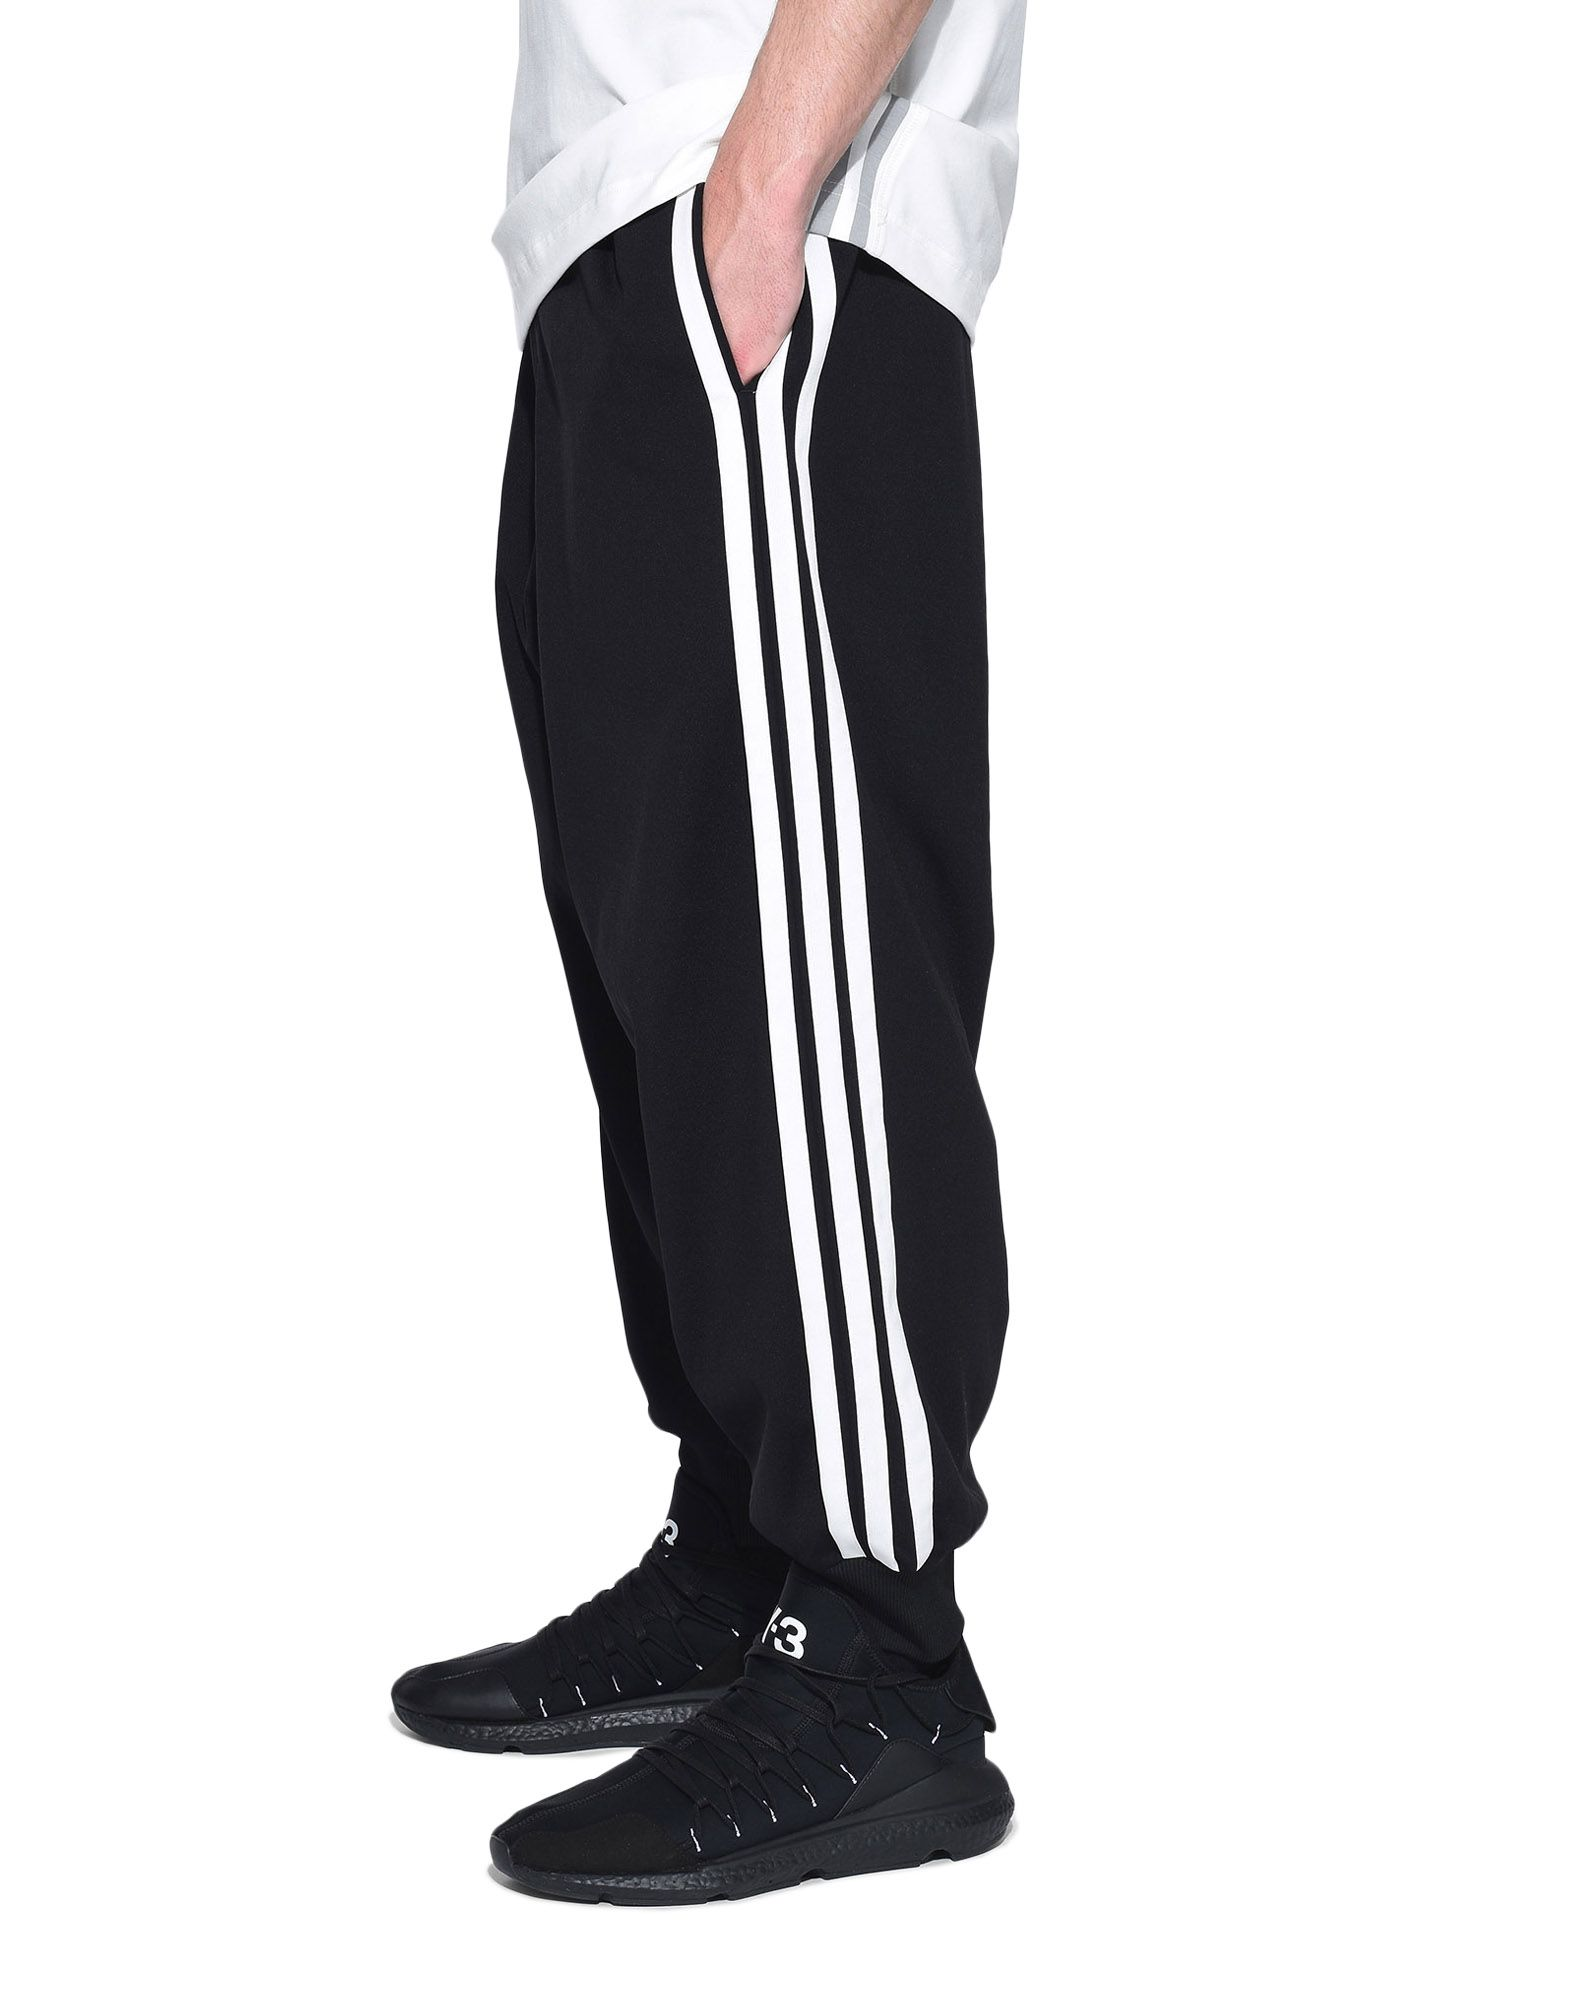 Y-3 Y-3 3-Stripes Selvedge Matte Track Pants Track pant Man e